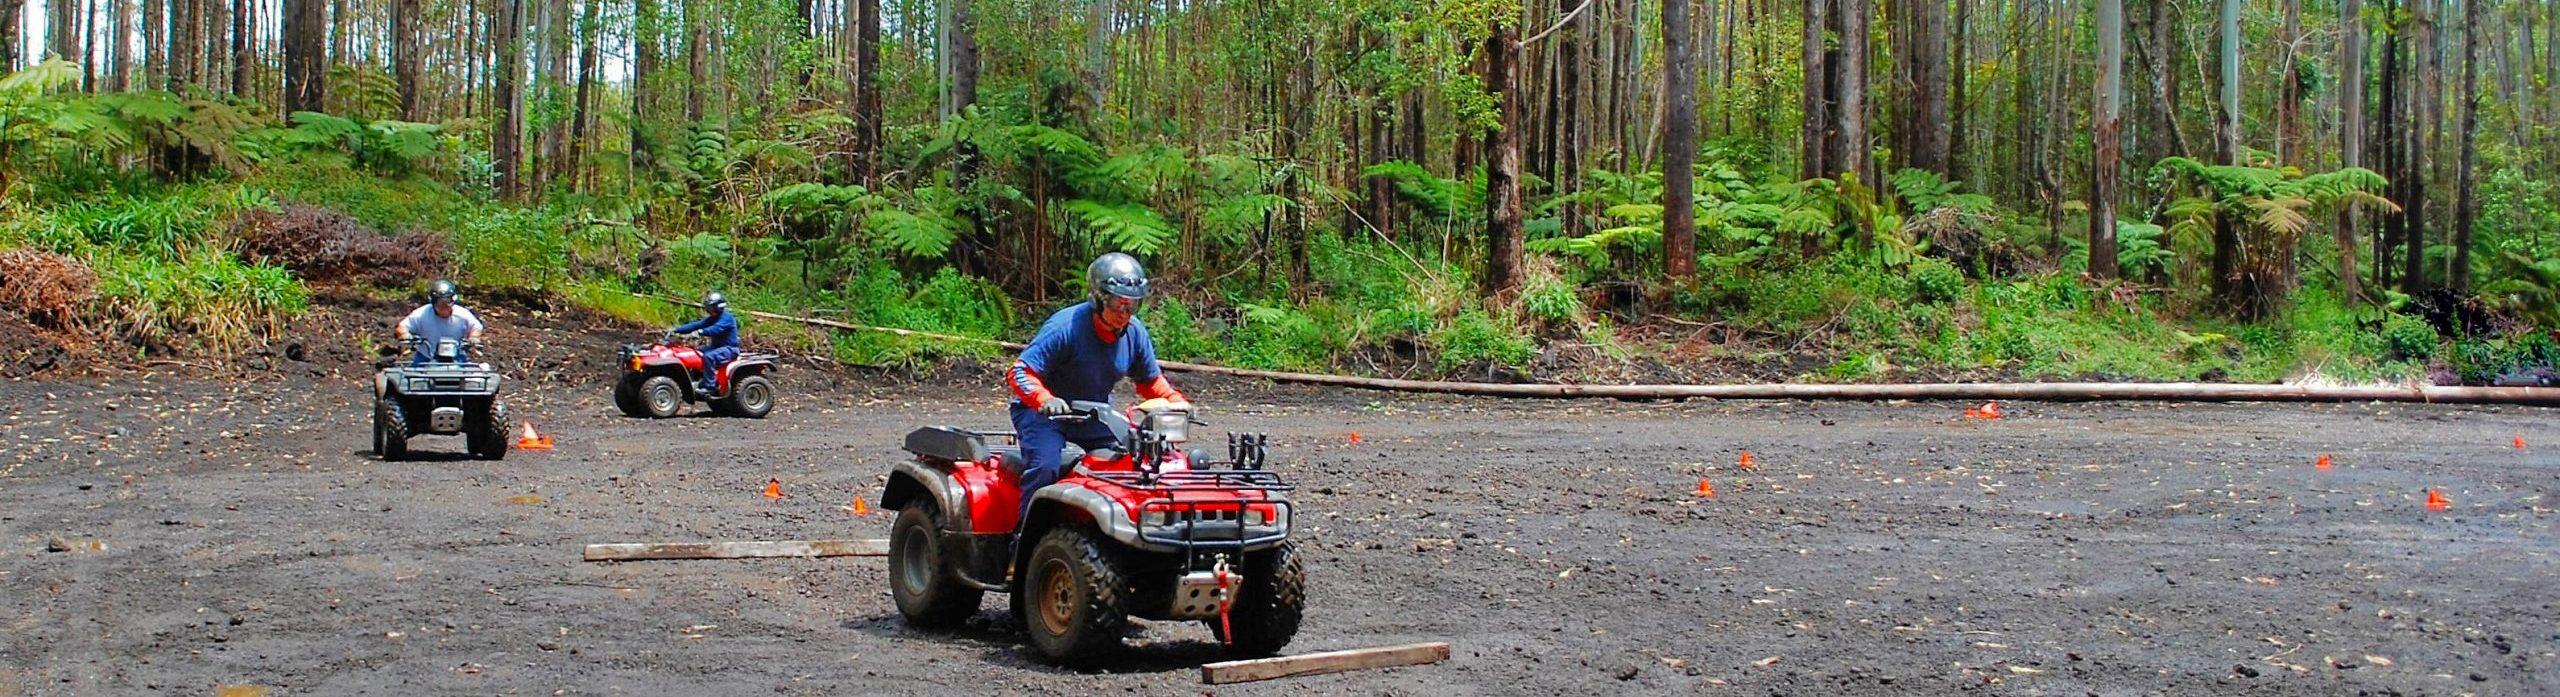 ATV riders at the Upper Waiakea ATV and Dirt Bike Park on Hawaii Island.